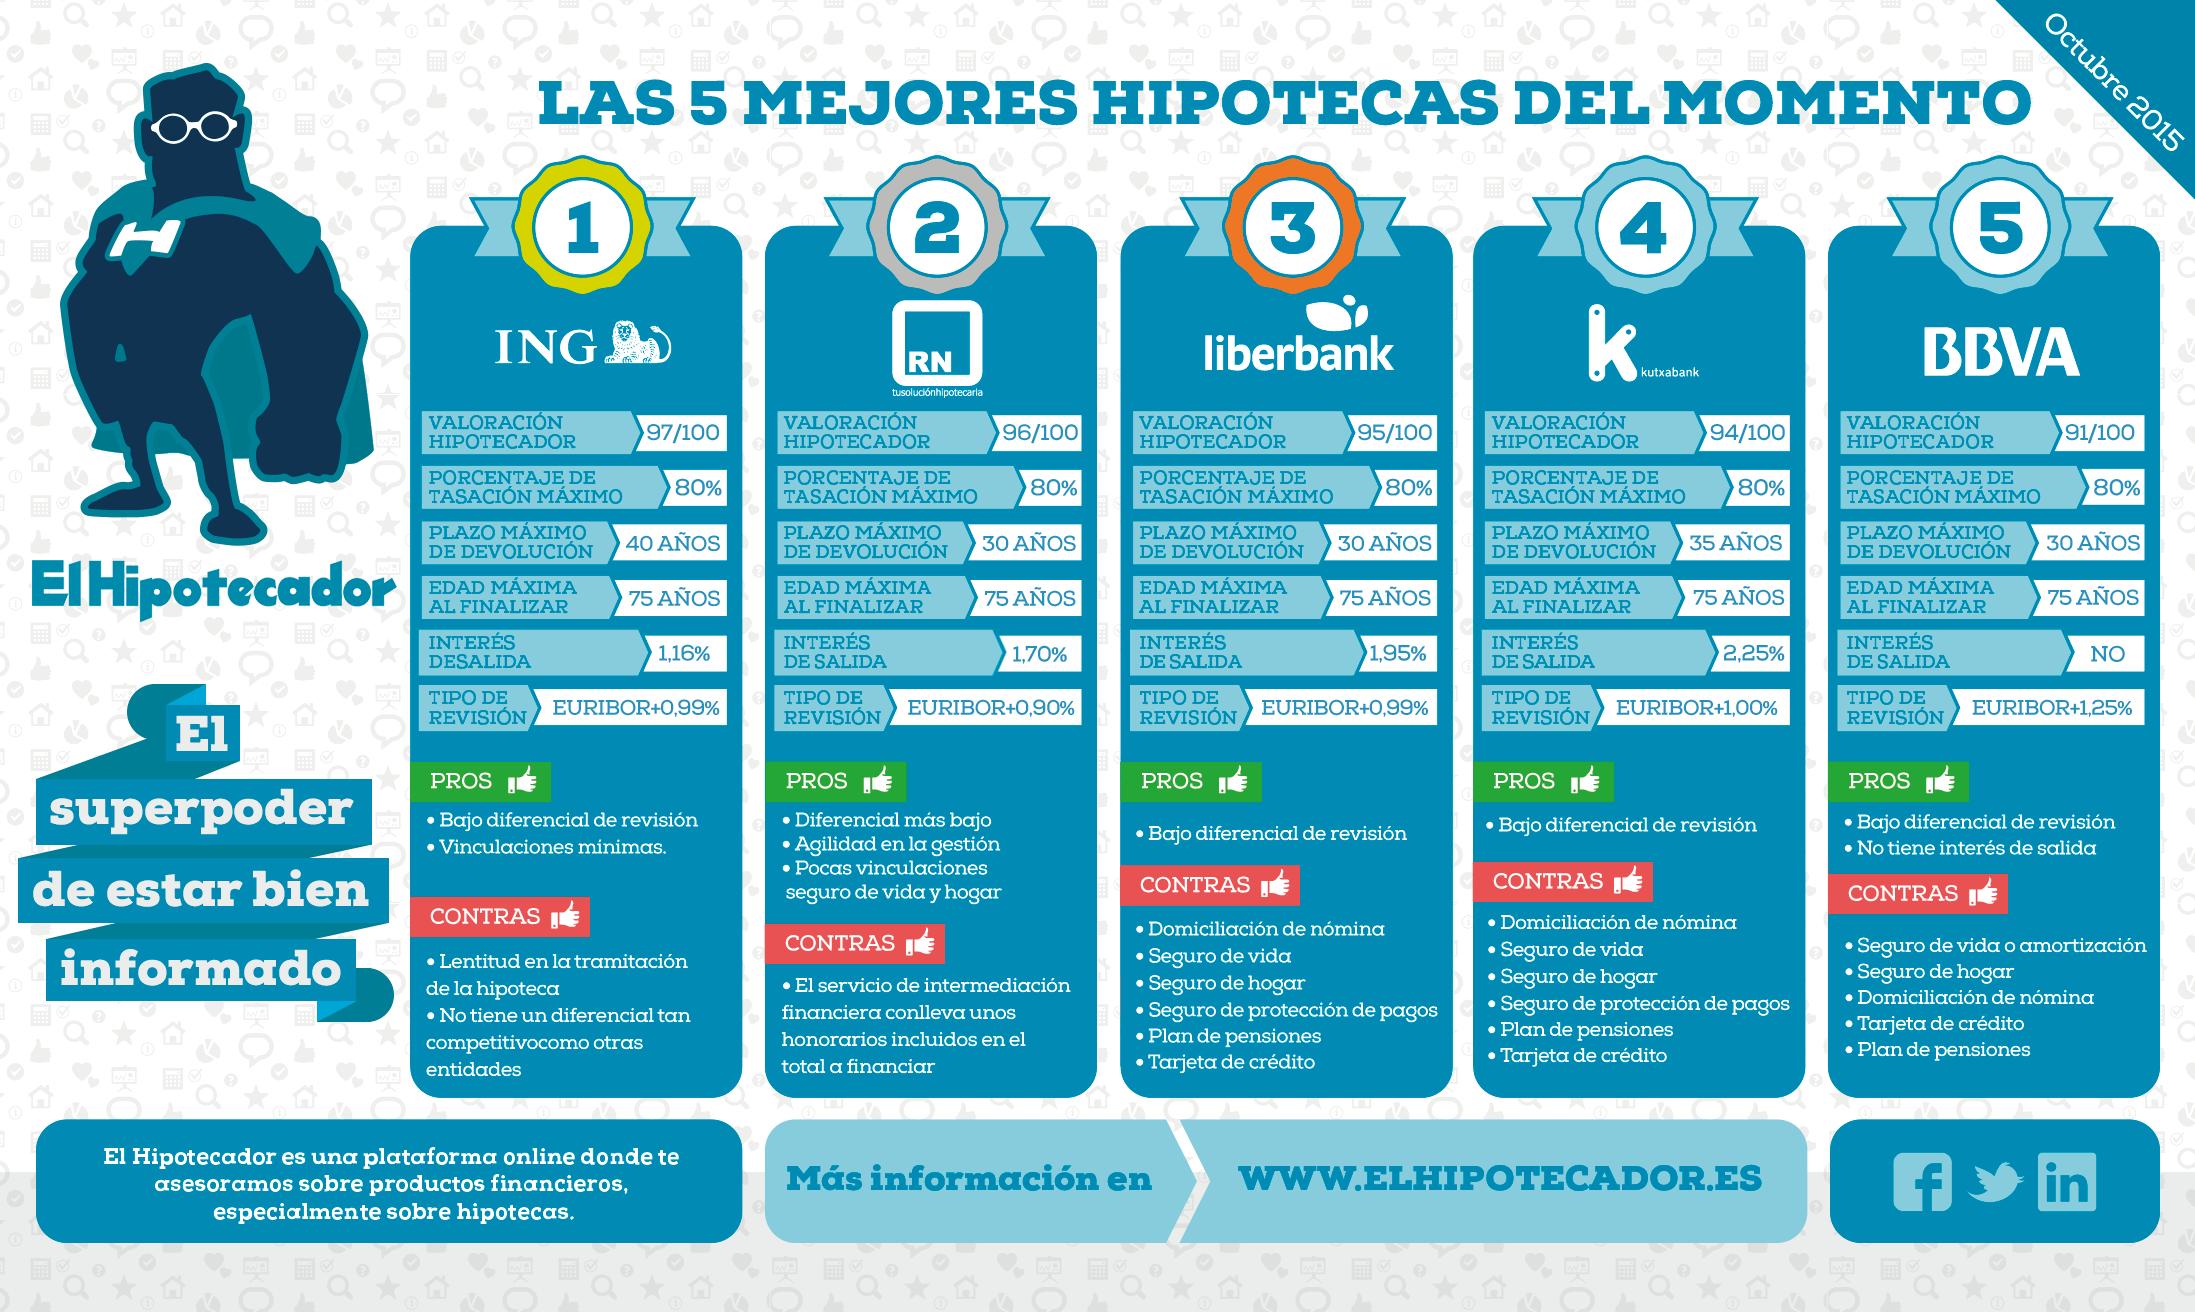 Infografia-Mejores-Hipotecas-Variables-(El-Hipotecador)---octubre-2015-1